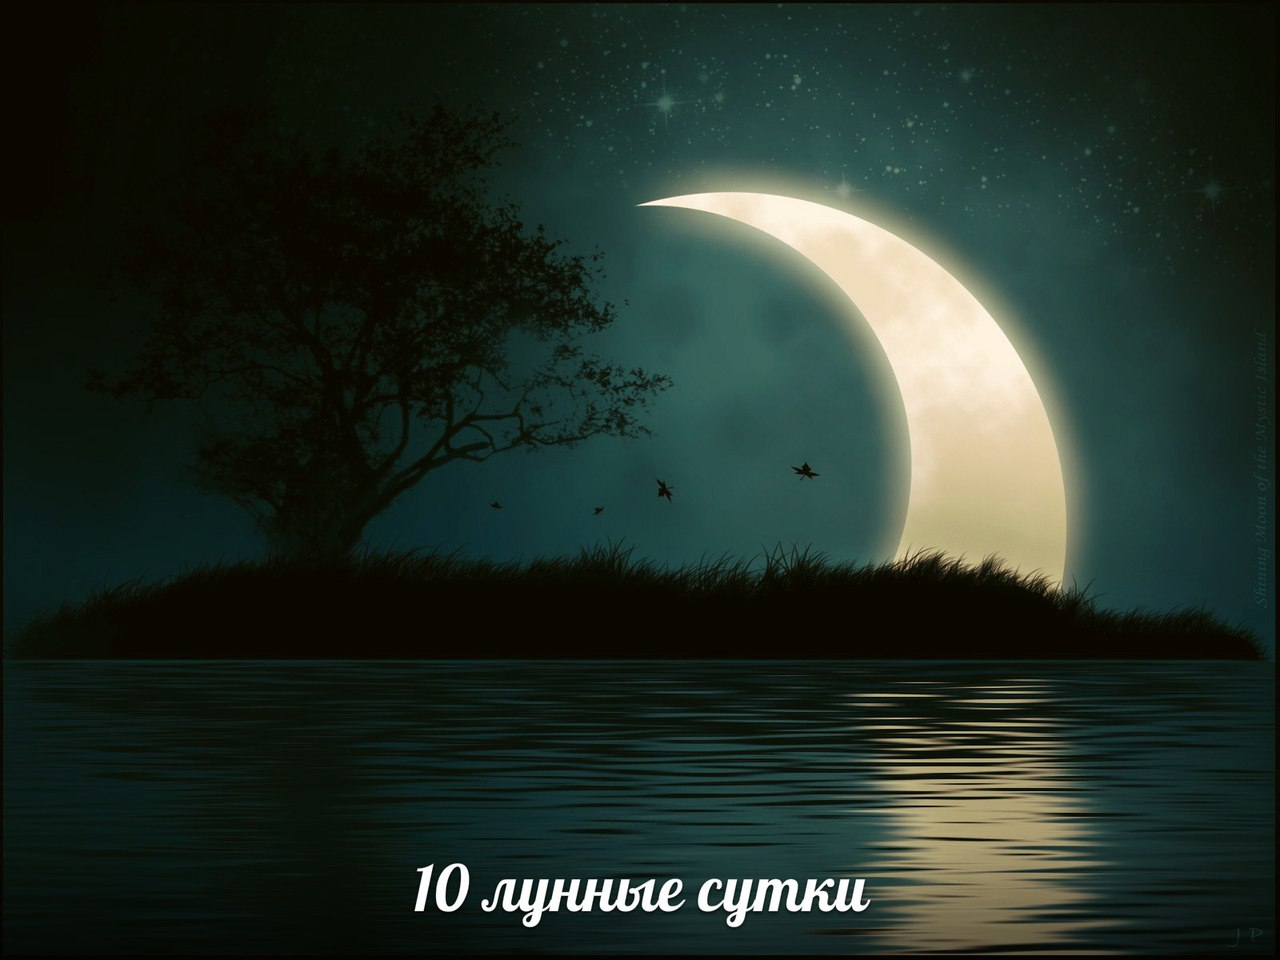 gP_MQFfmkVU.jpg